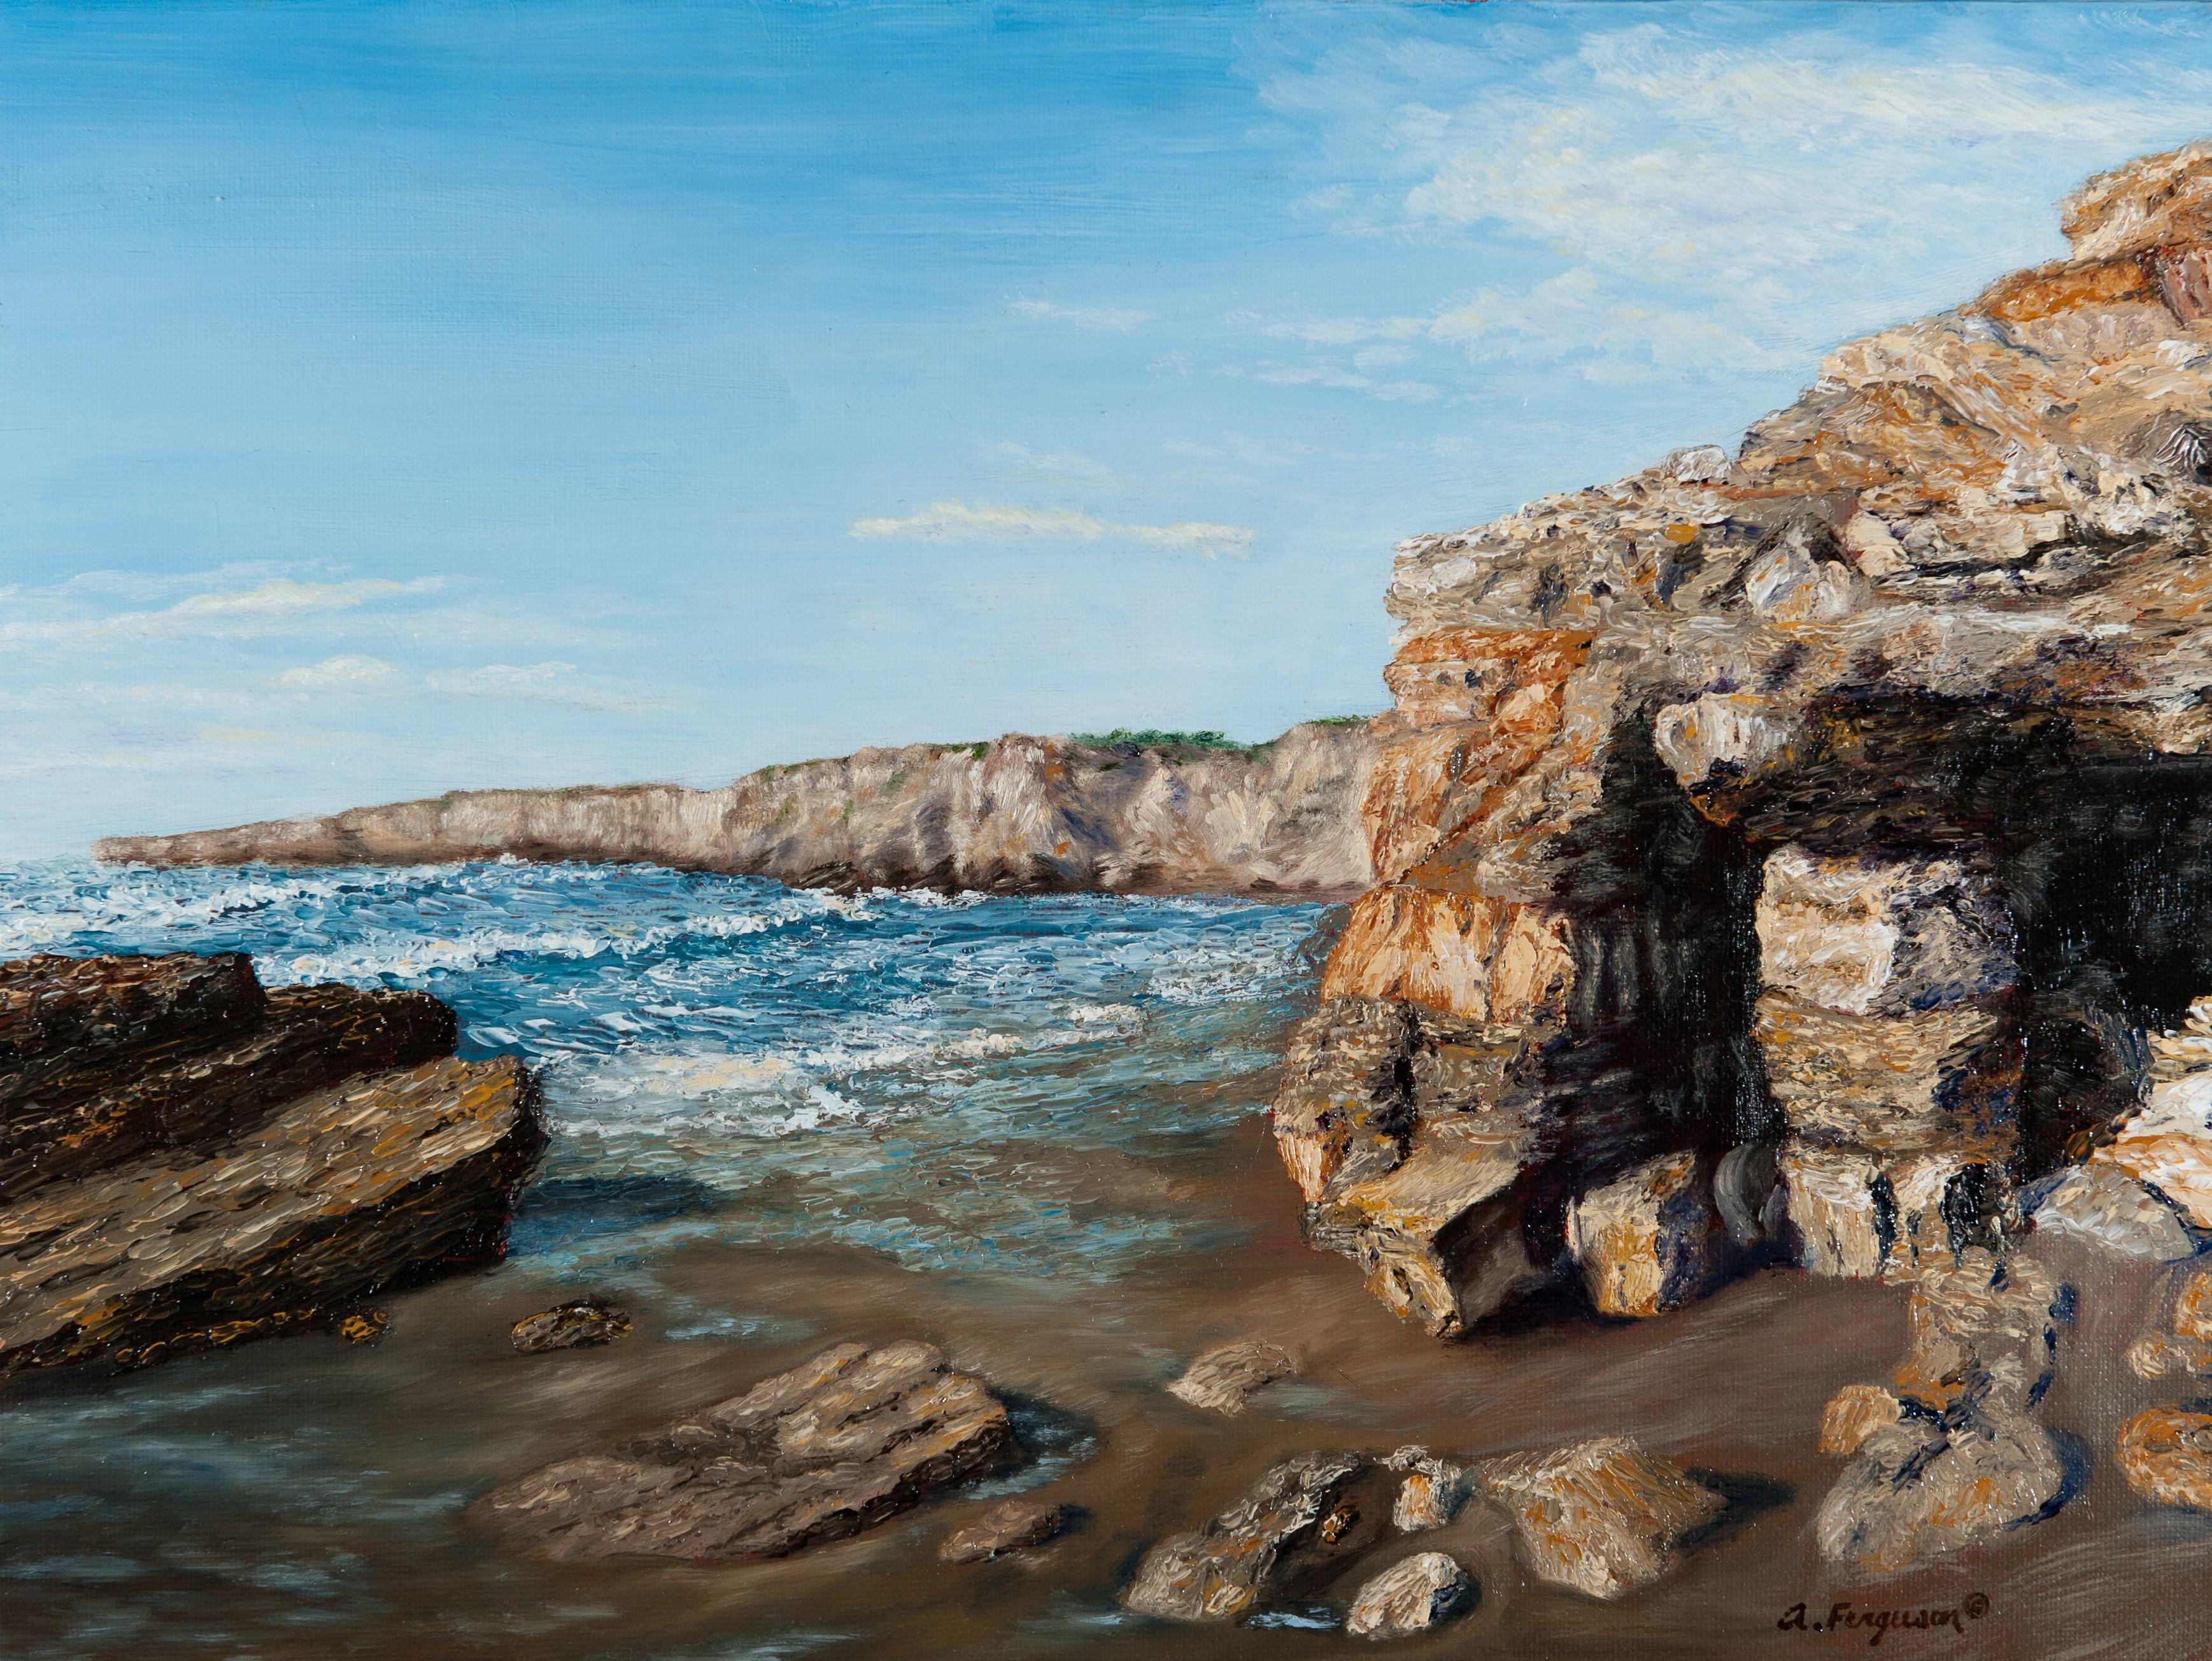 wall beach vandenberg afb california 12 x16 oil on panel painting